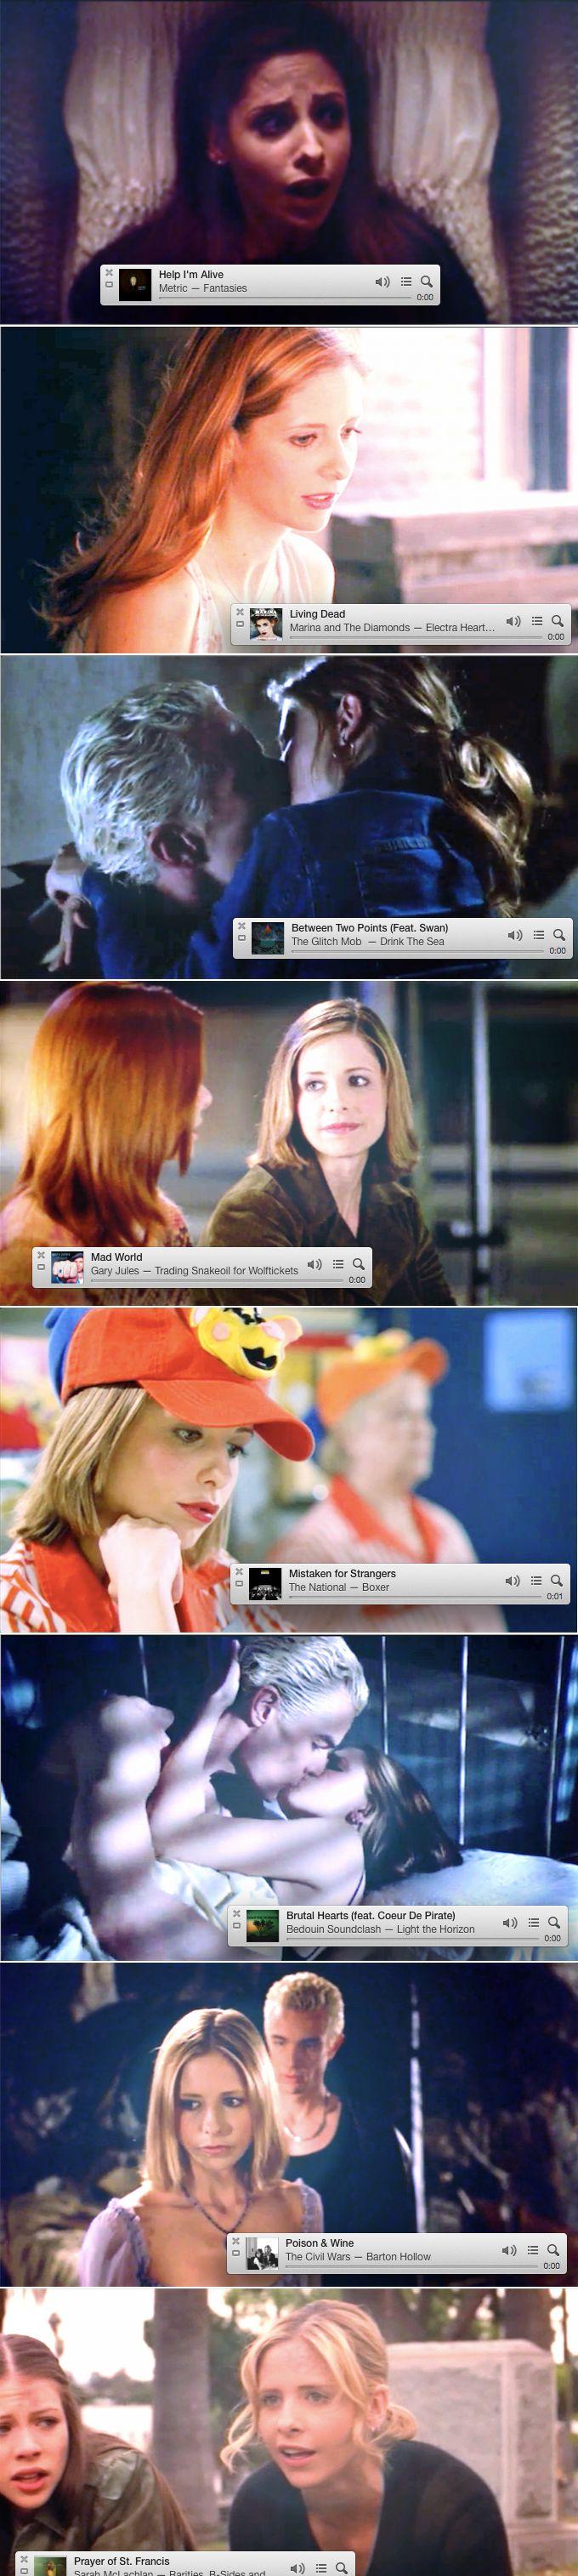 A Buffy Summers Season 6 Playlist #btvs